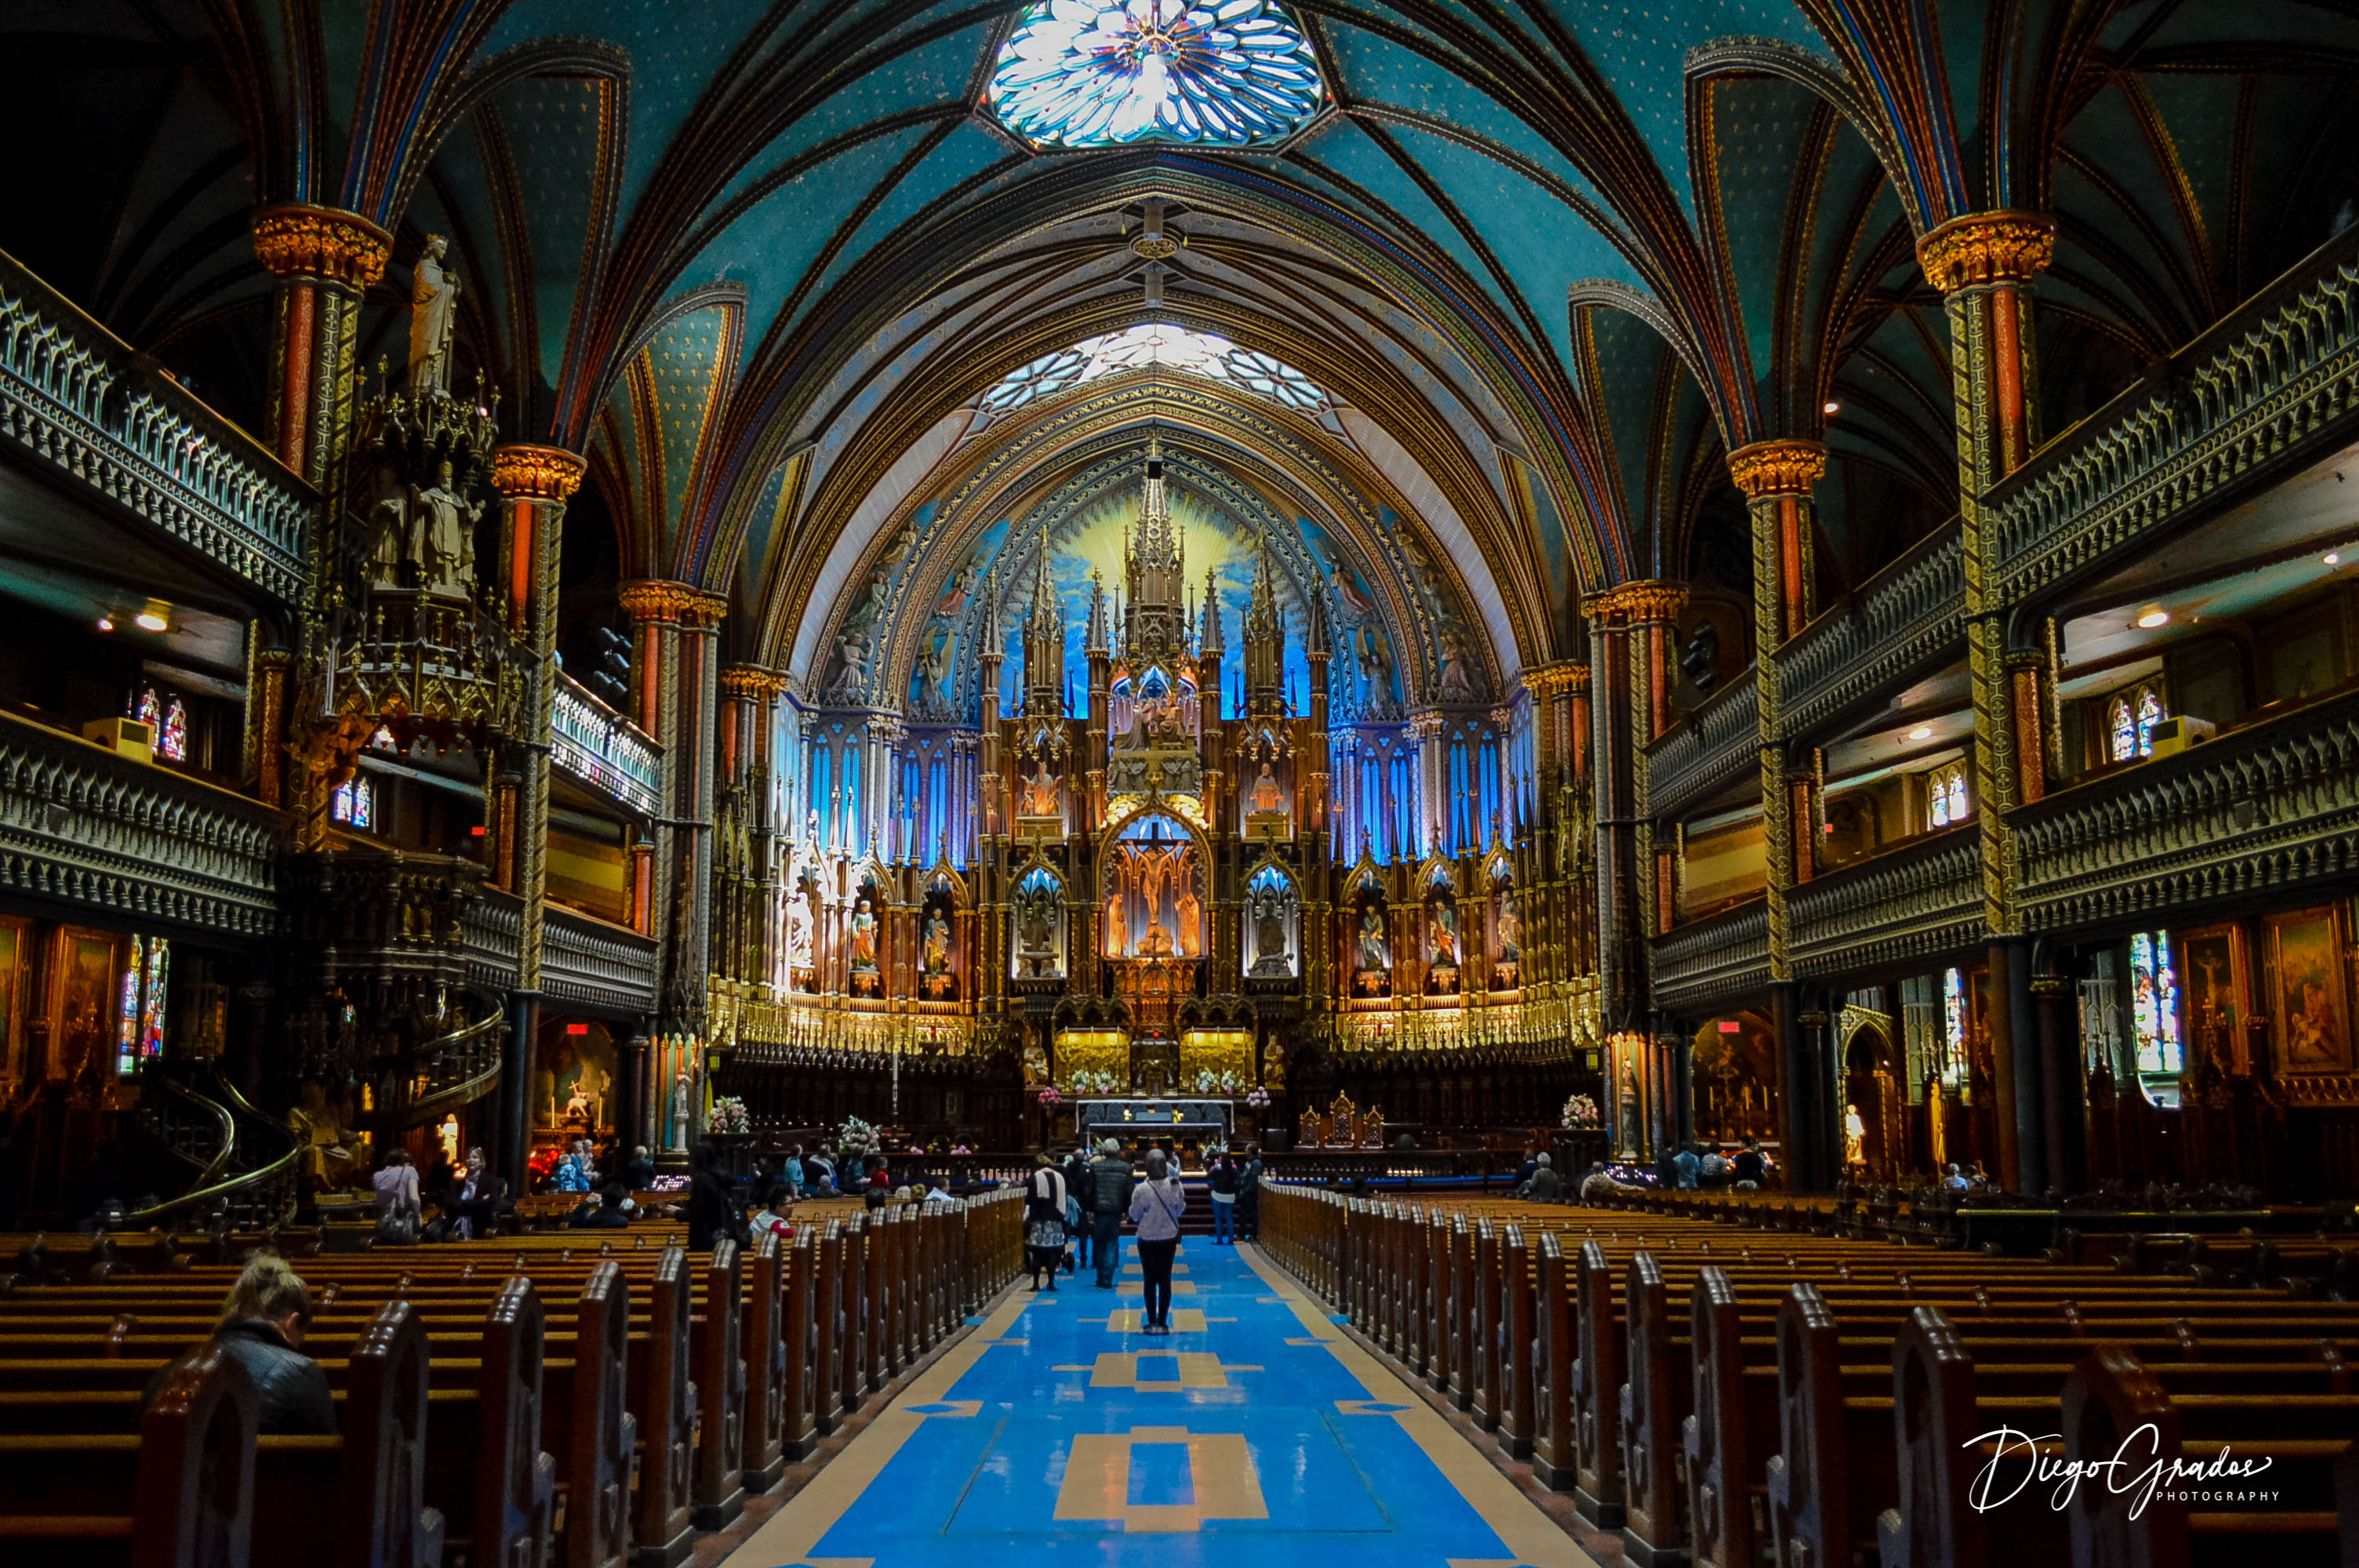 Basilique Notre-Dame de Montréal interior